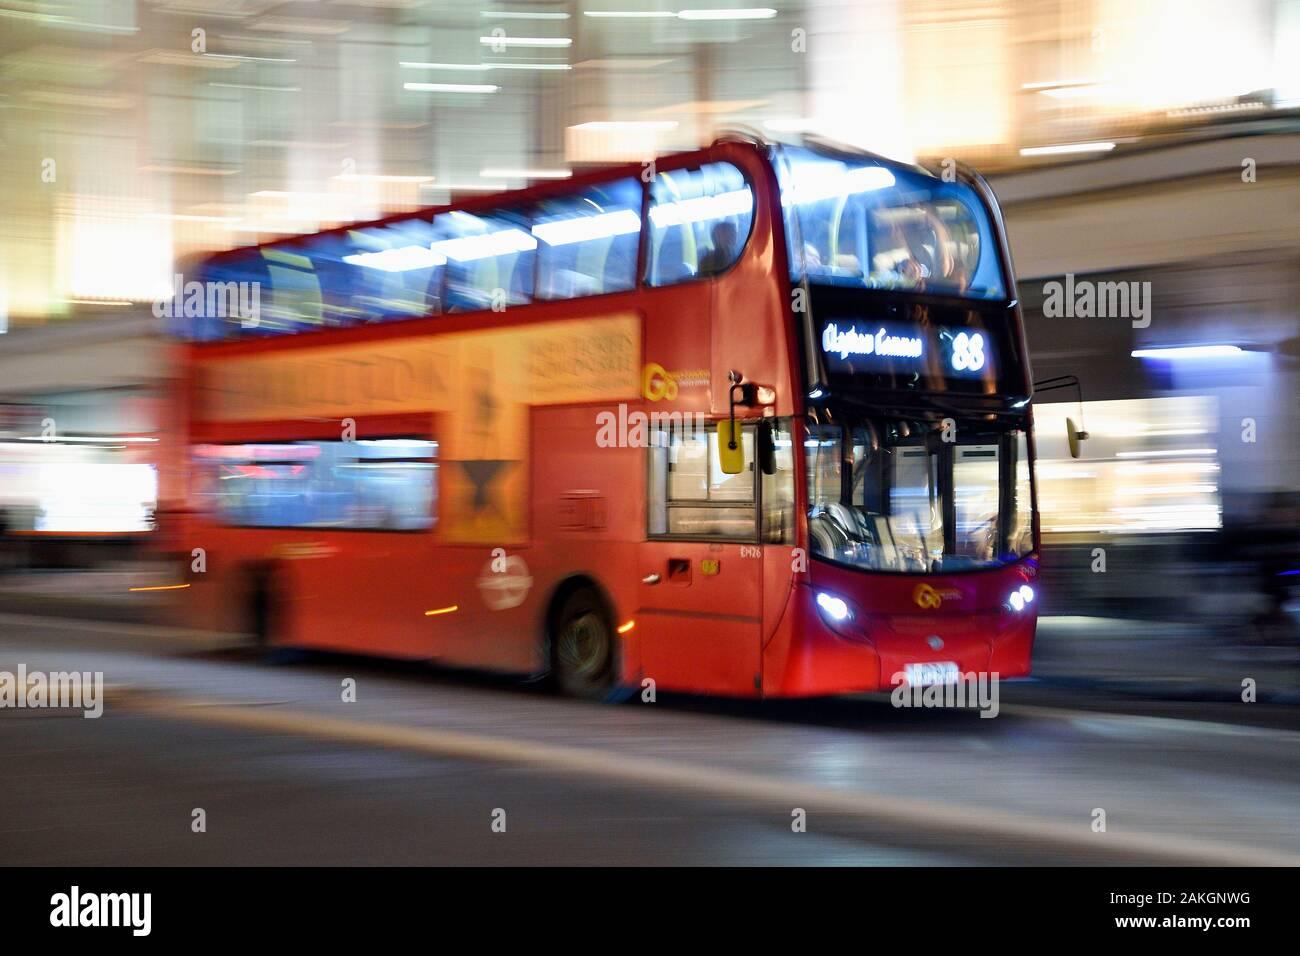 United Kingdom, London, Regent street, red double decker bus Stock Photo